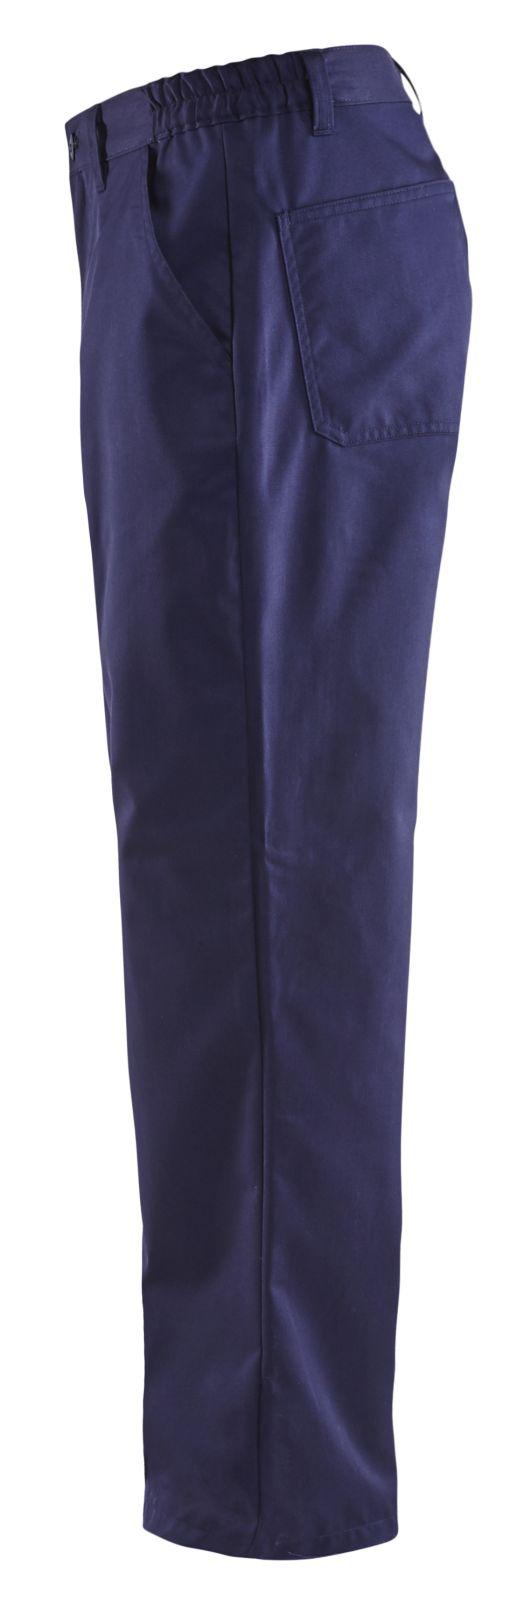 Blaklader Broeken 17251800 marineblauw(8900)